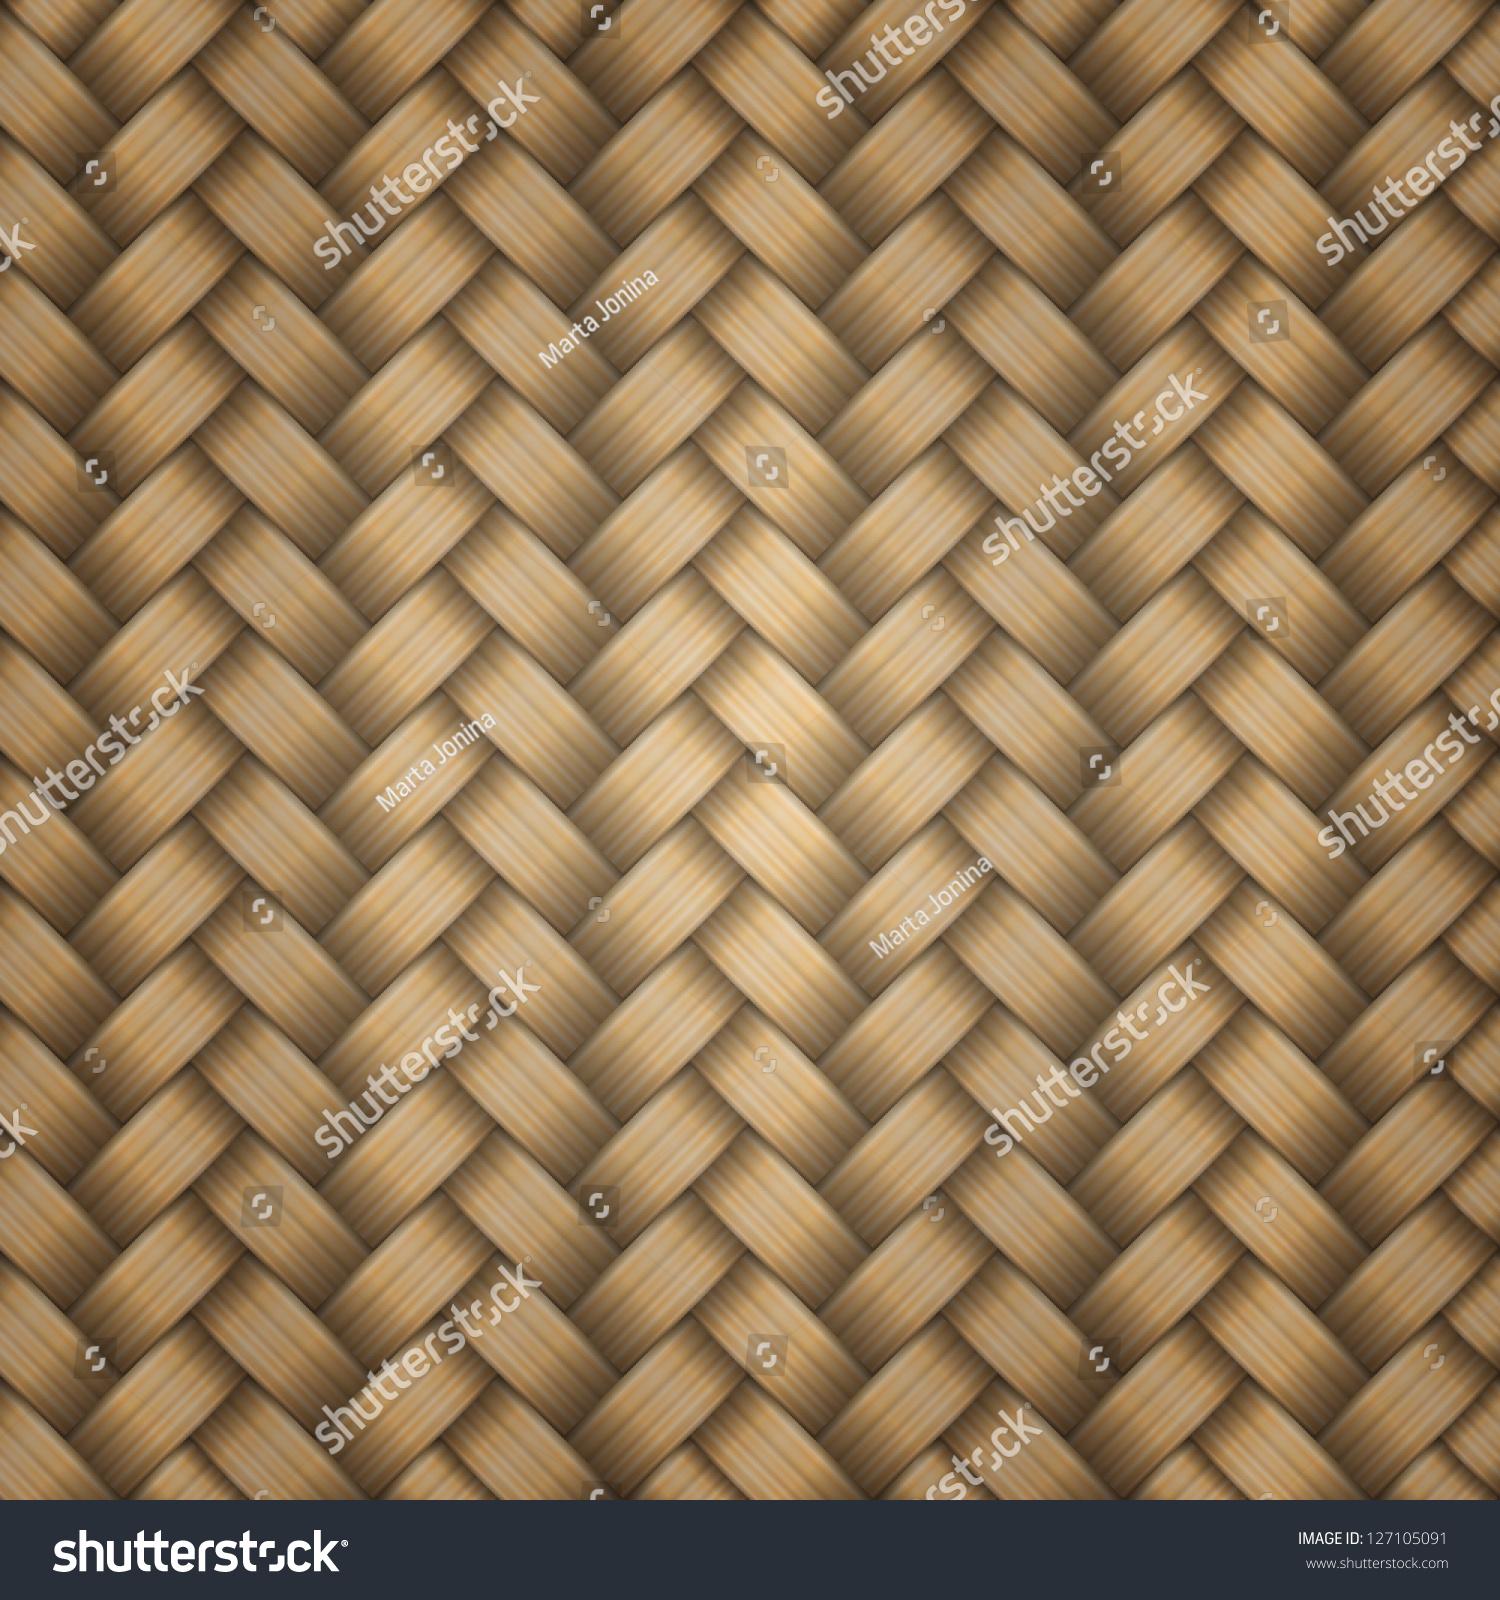 Seamless Tiling Wicker Texture Vector Stock Vector